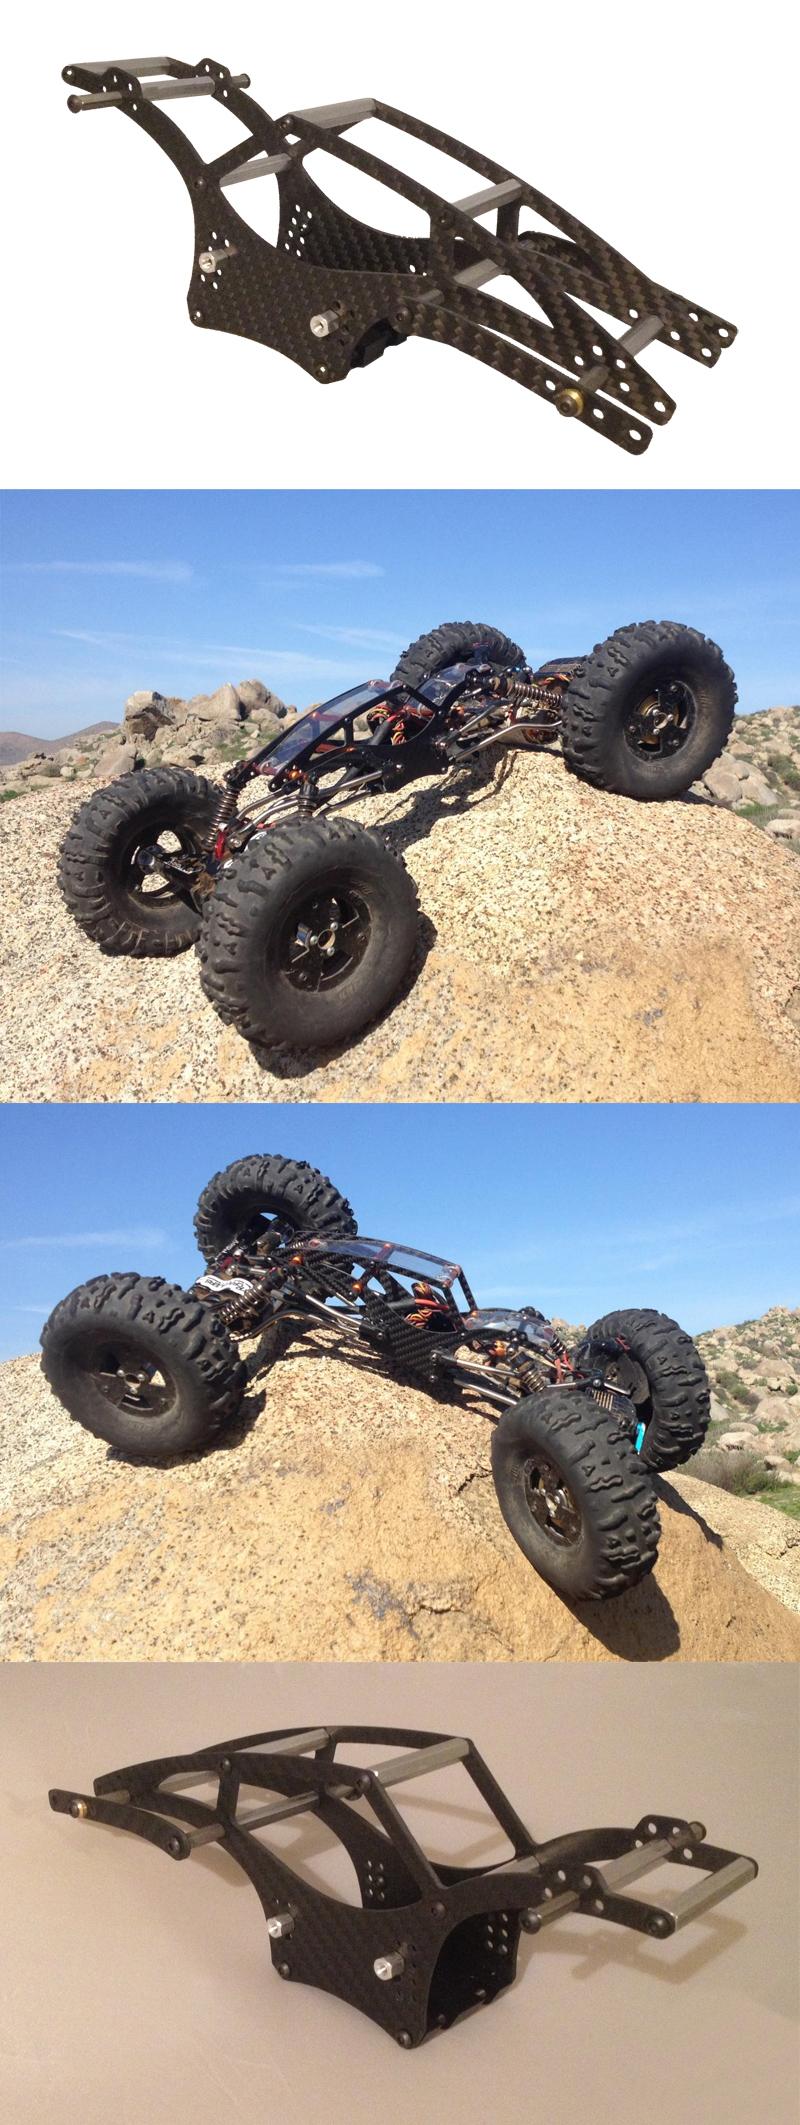 ...PROGRESS 10   2.2 chassis